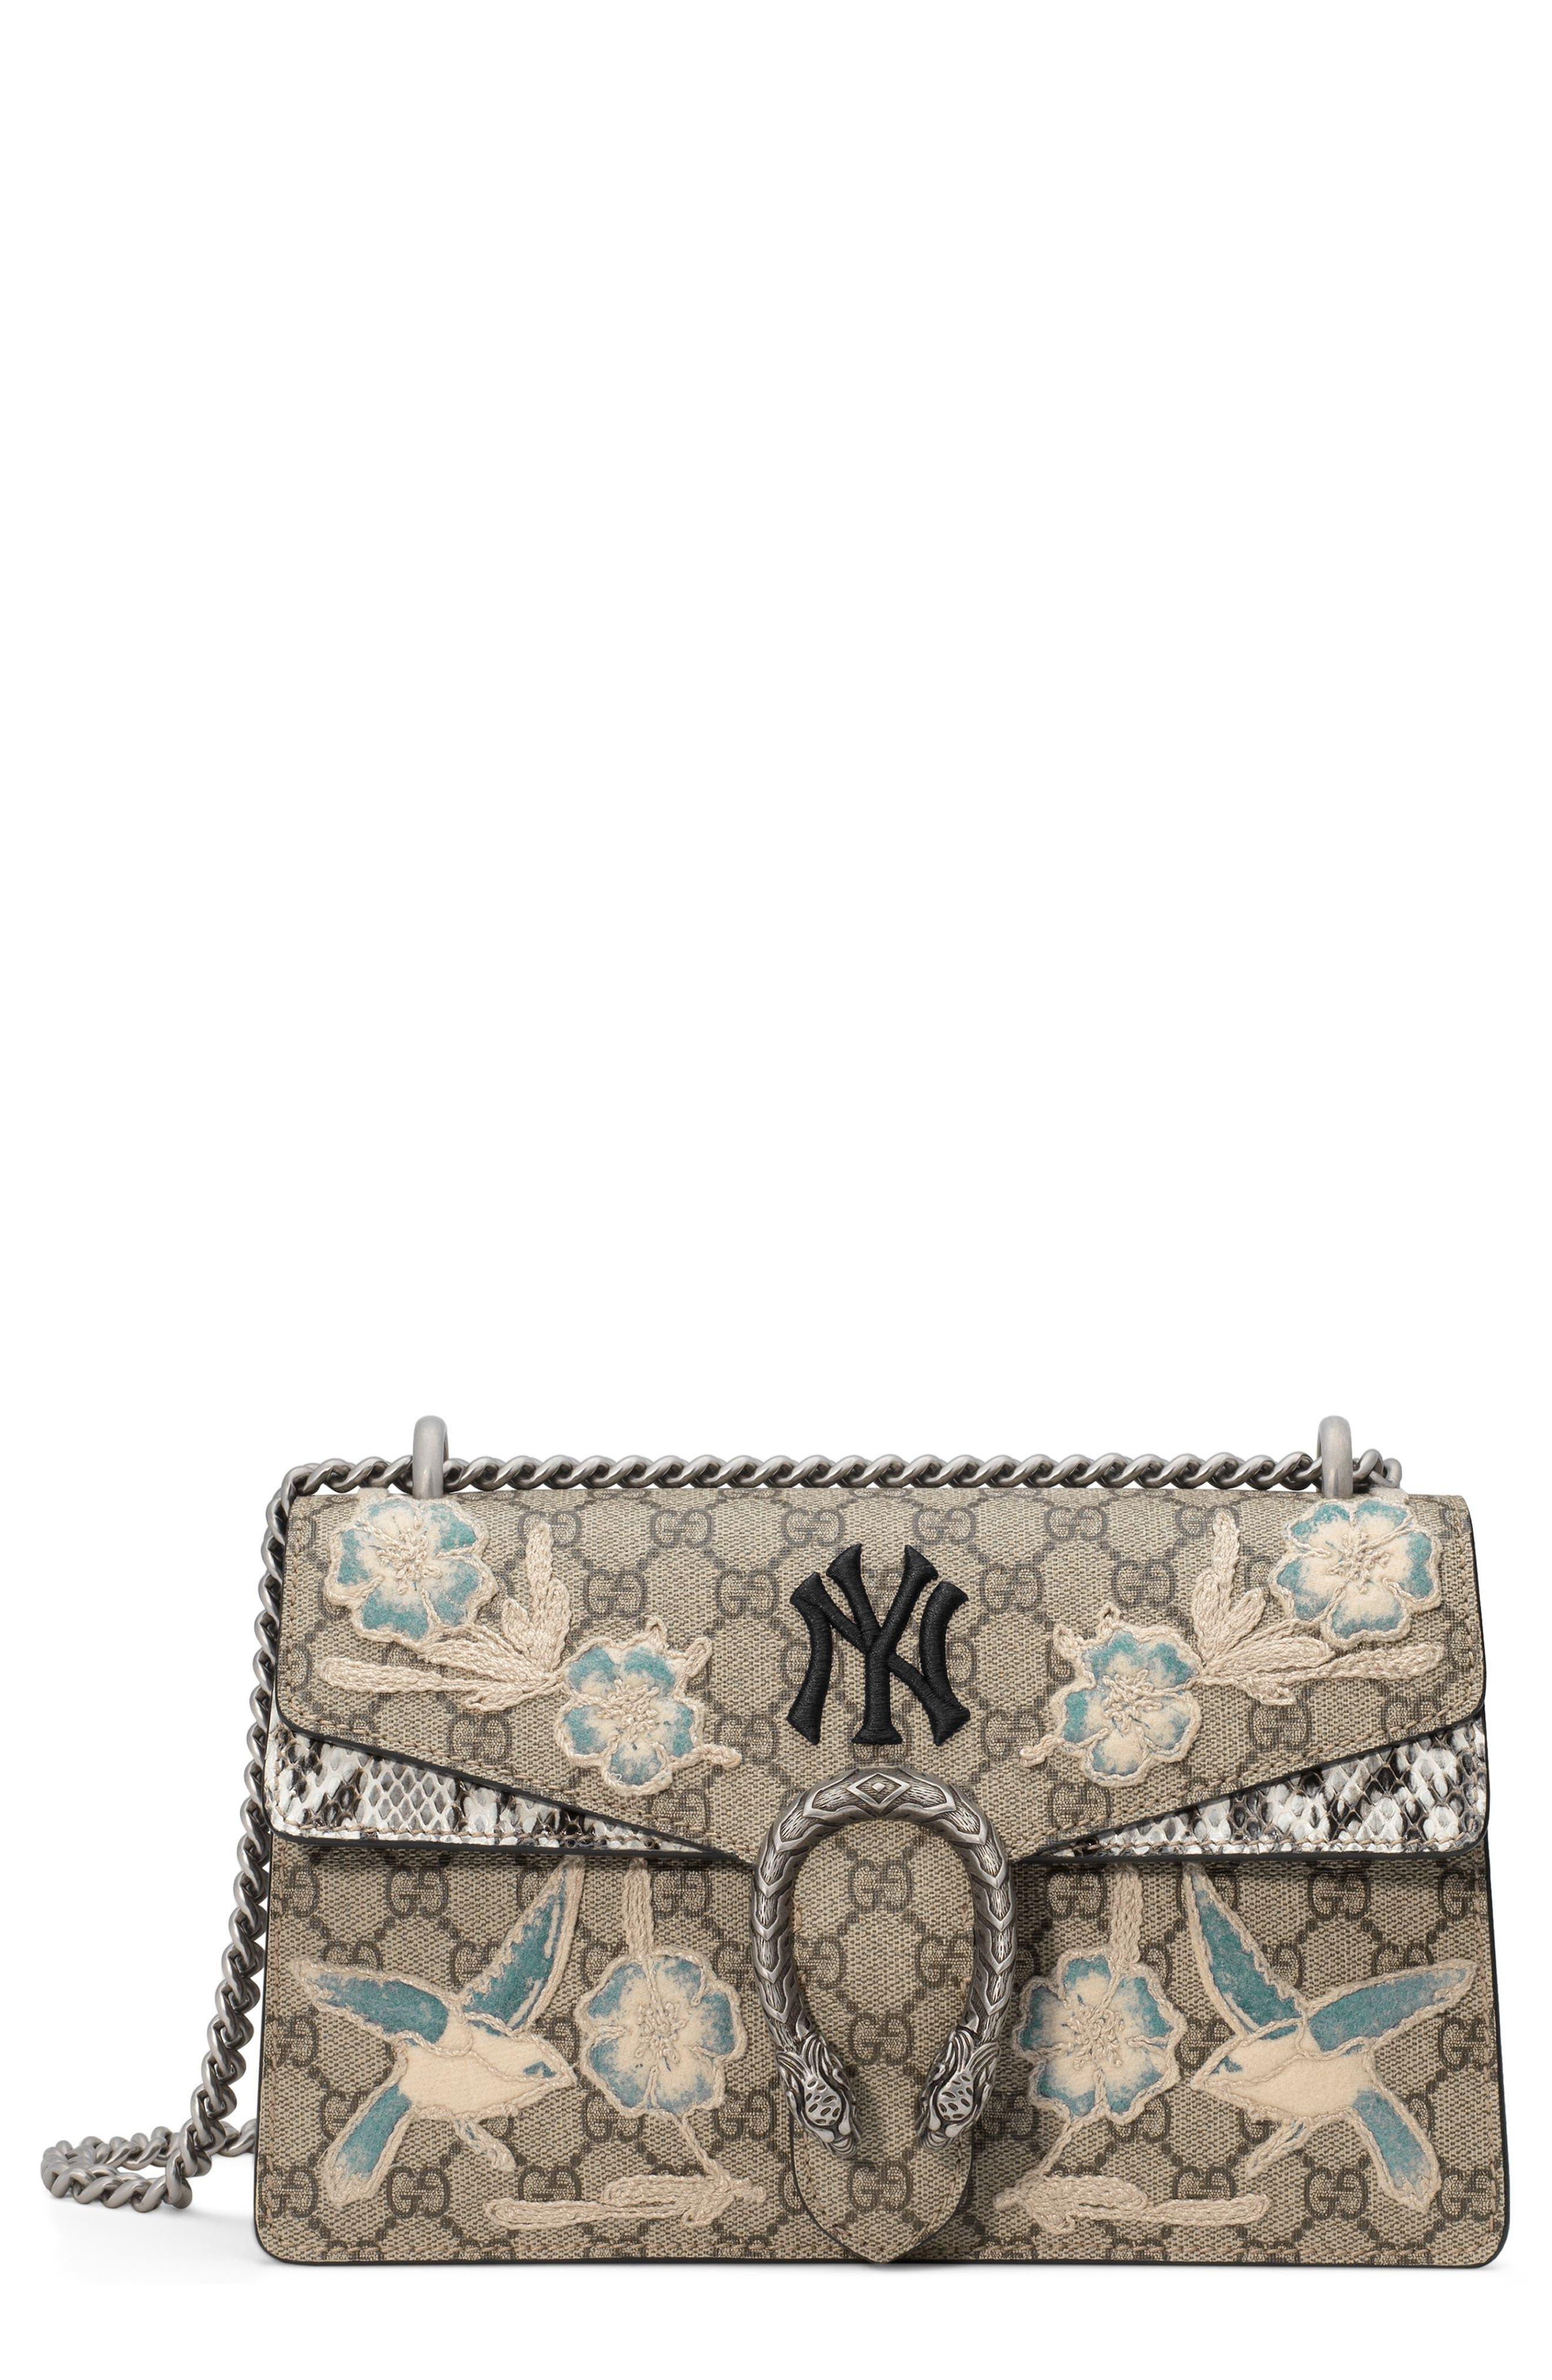 Medium Dionysus GG Supreme & Genuine Snakeskin Shoulder Bag,                         Main,                         color, BEIGE EBONY/ ROCCIA MULTI